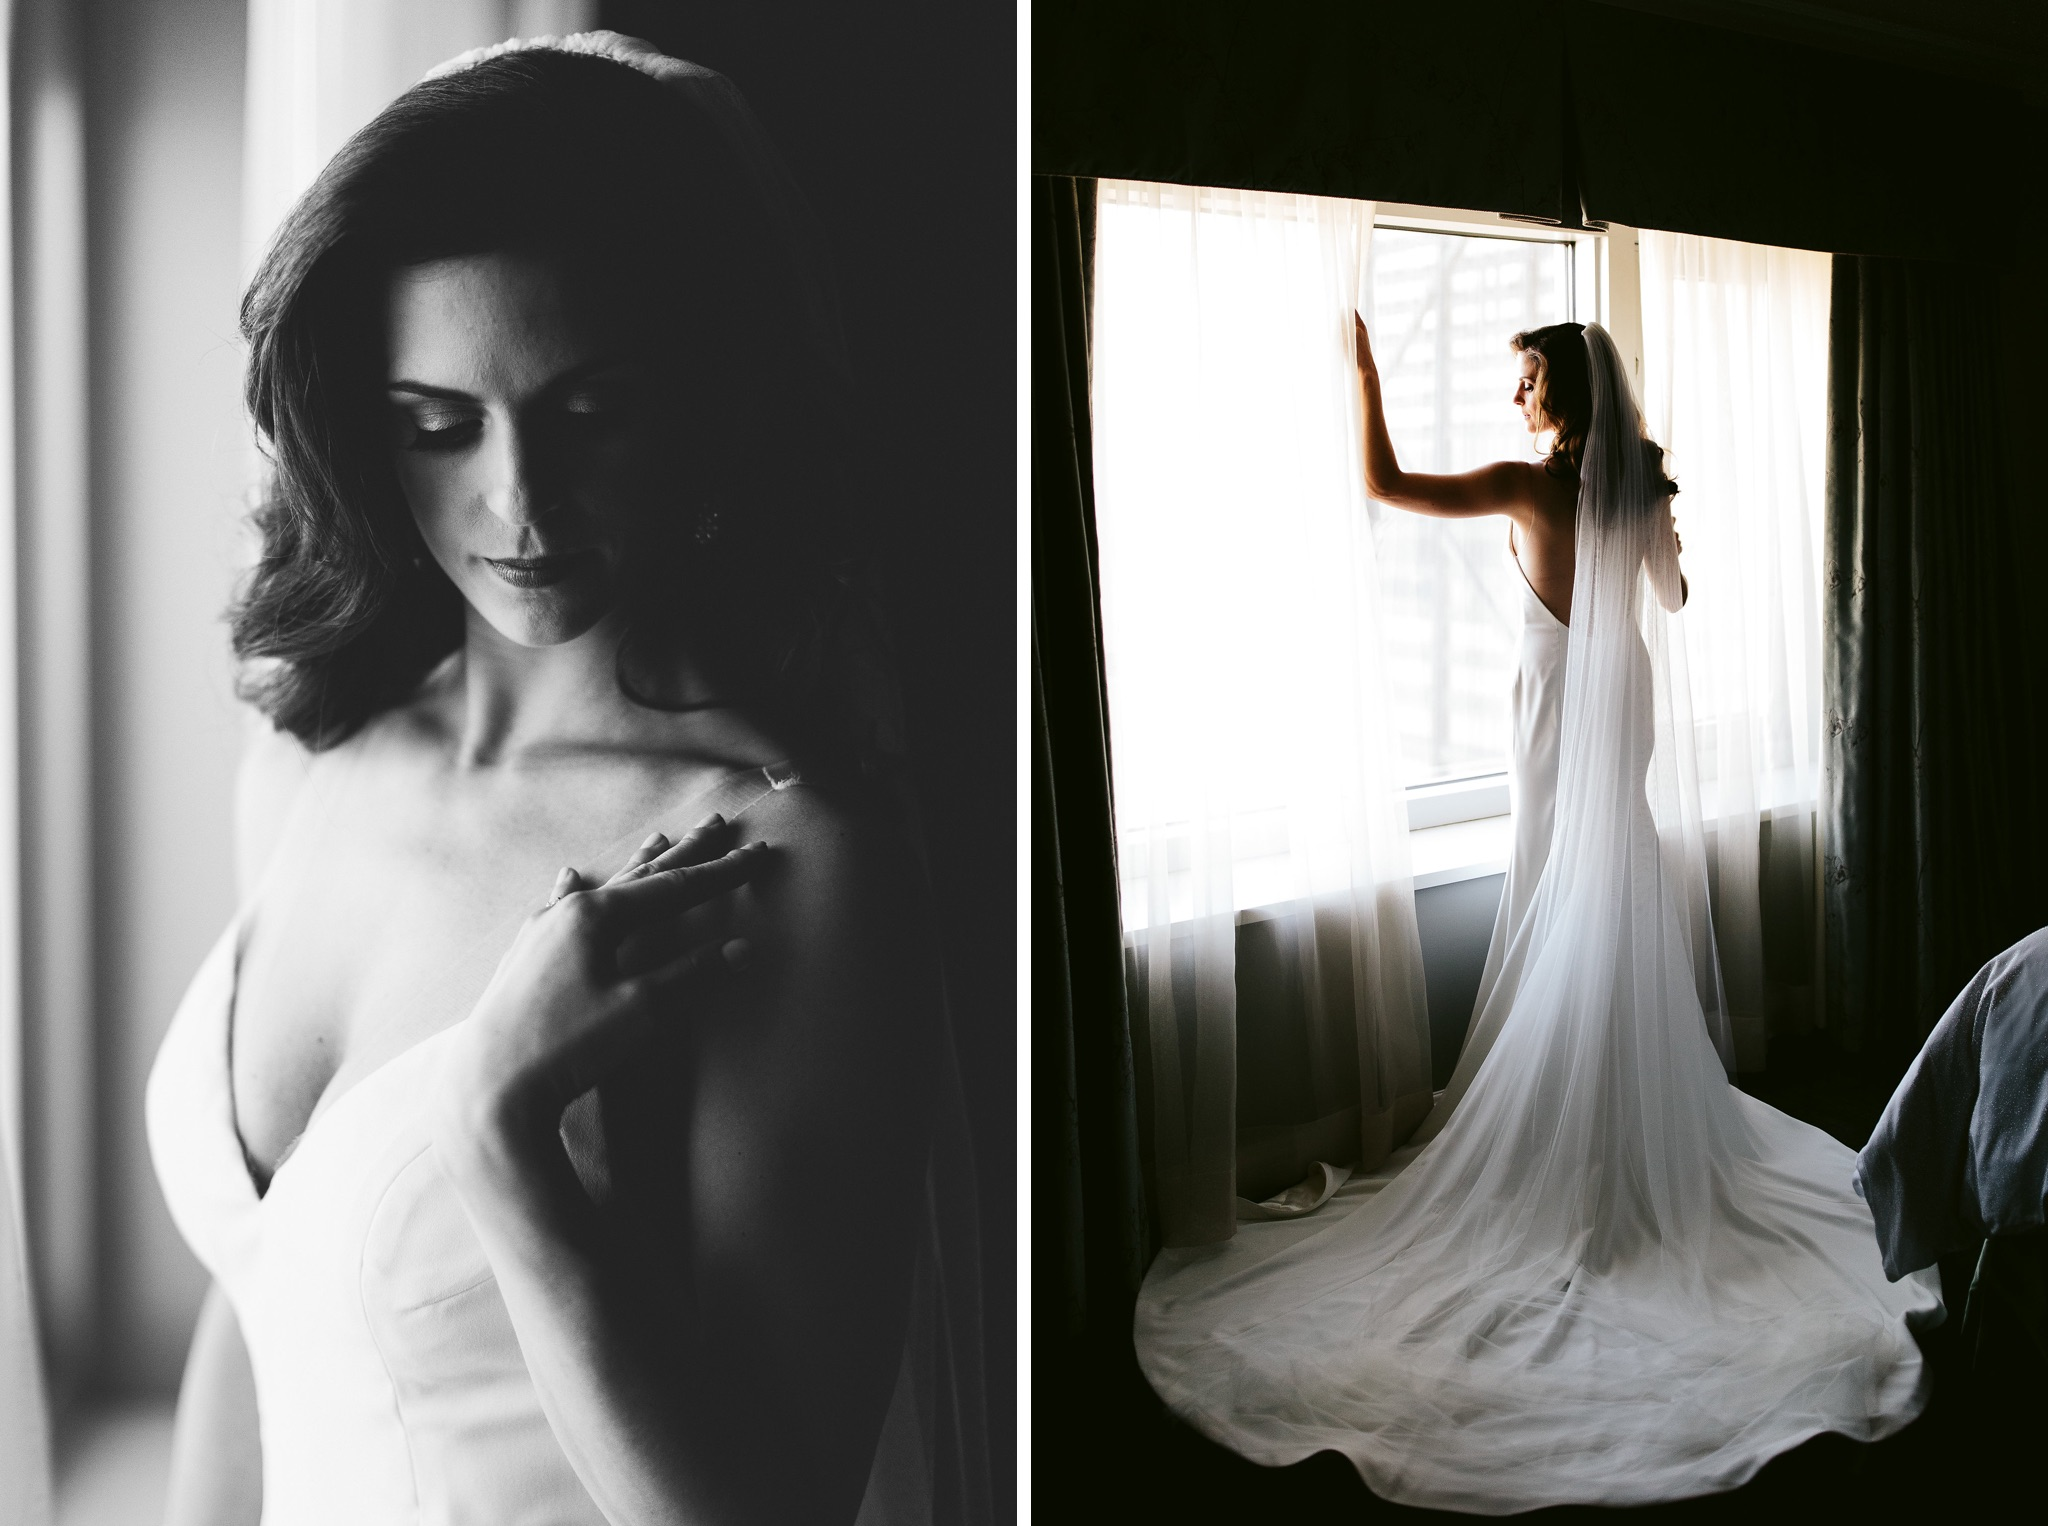 nicodem-creative-mahoney-salvage-one-chicago-wedding-photographer-inspiration-urban-allure-events-steves-flowers-alliance bakery